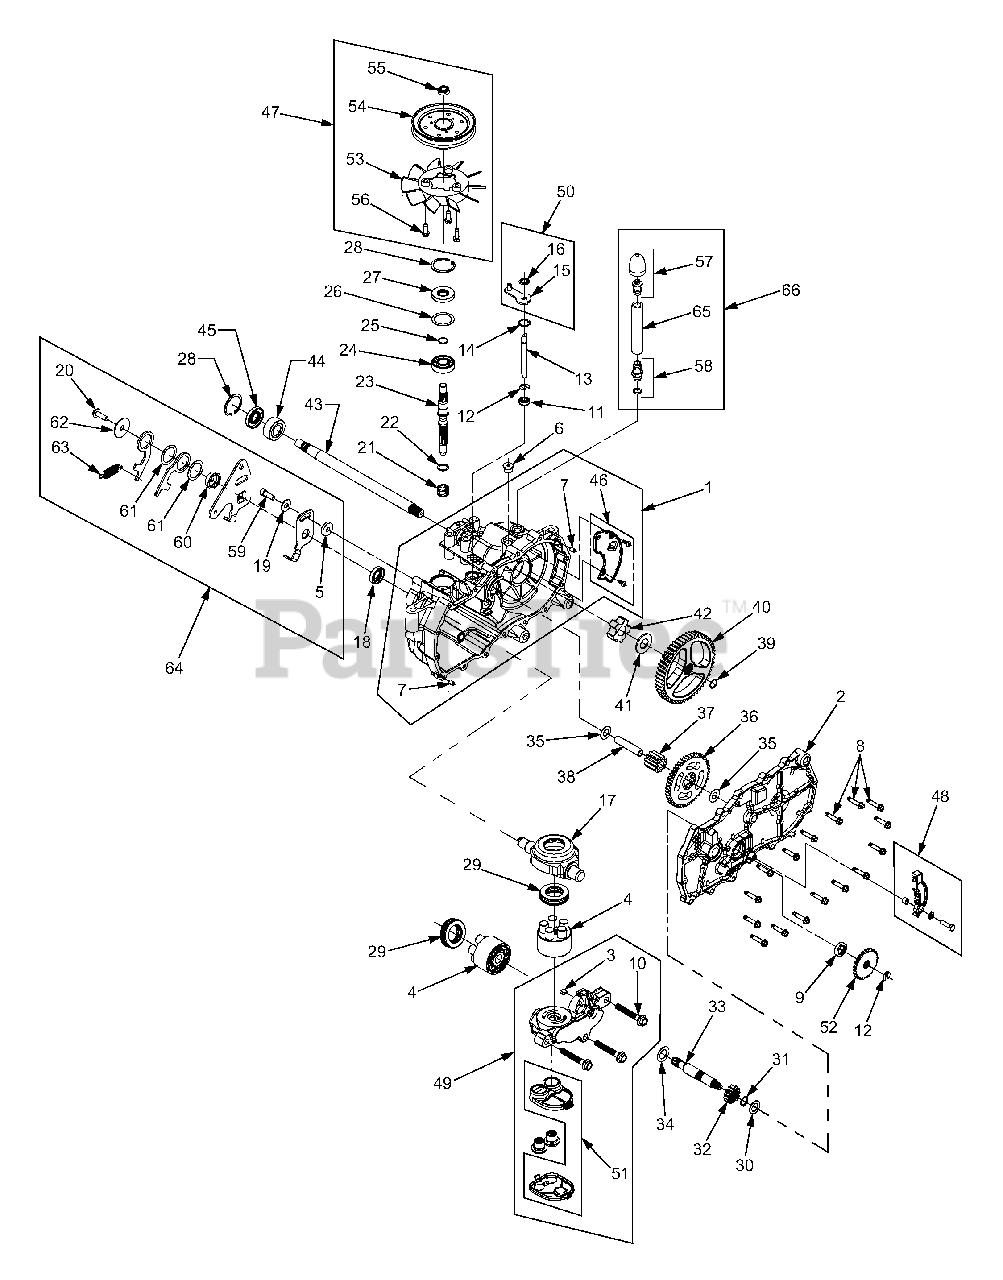 Diagram  Cub Cadet Zero Turn Rzt 22 Wiring Diagram Full Version Hd Quality Wiring Diagram